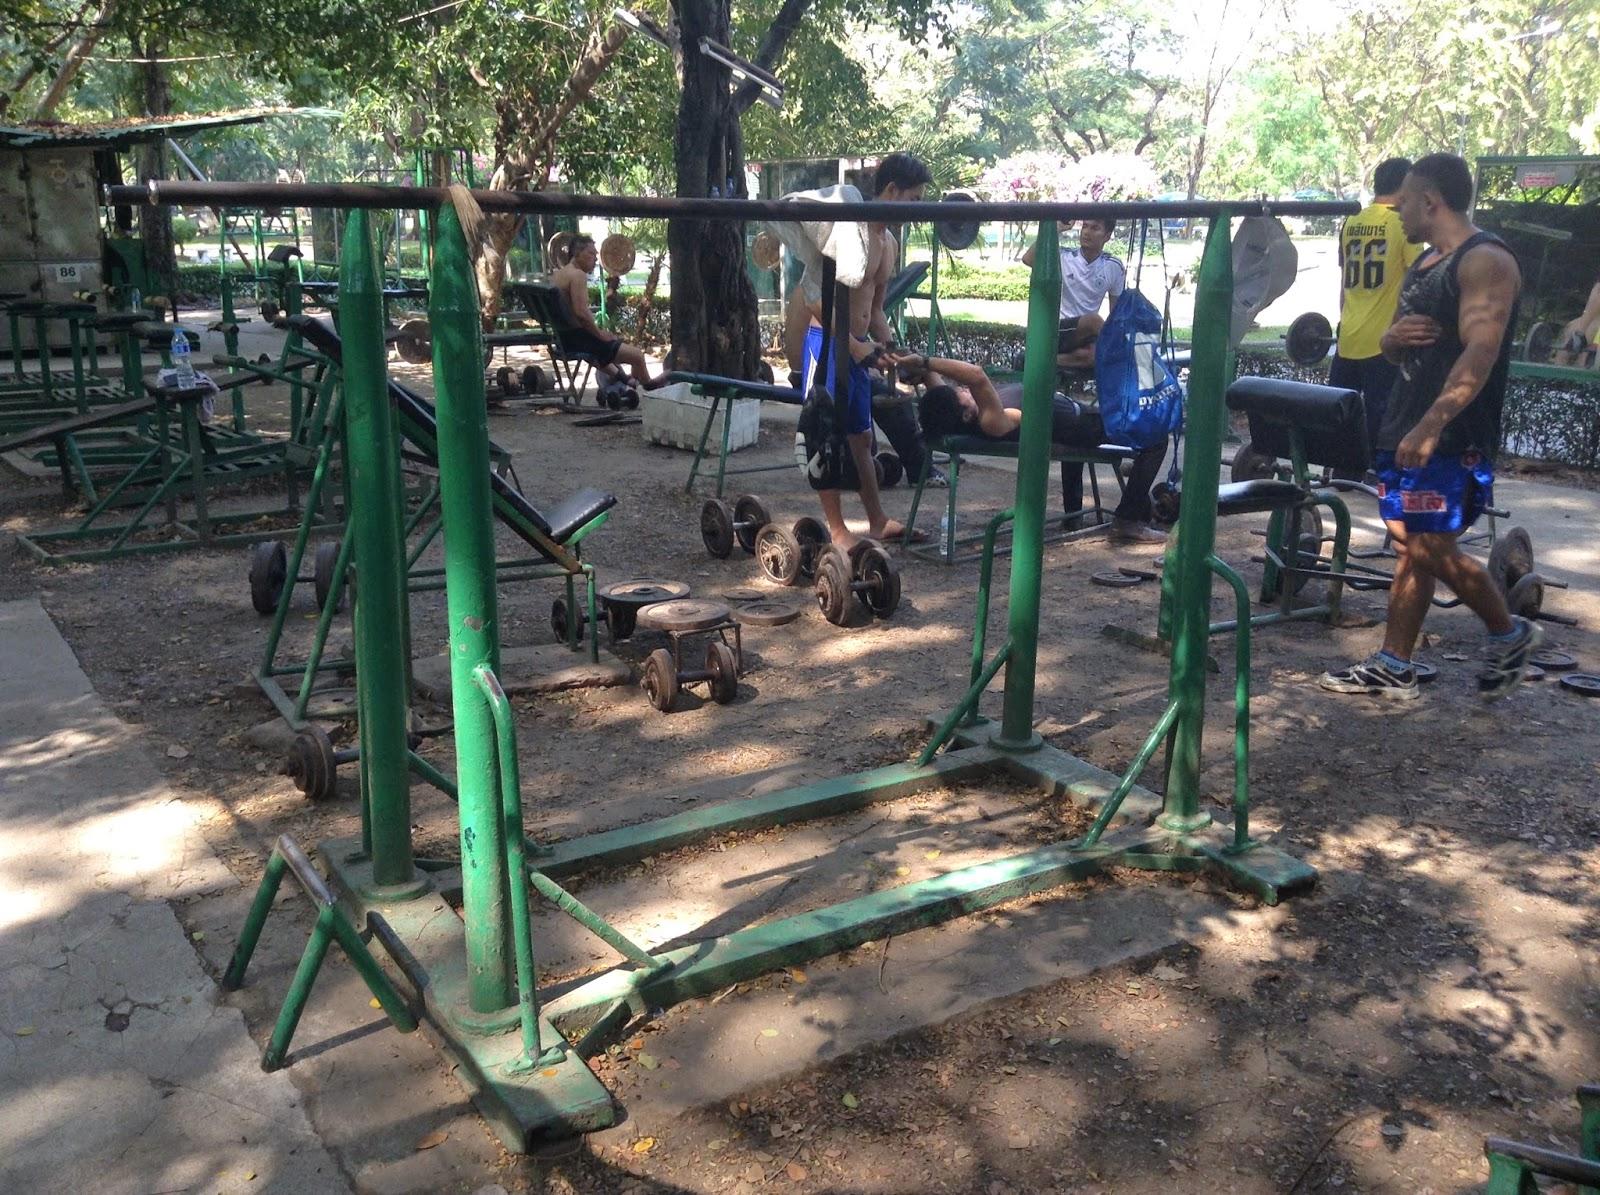 Best Outdoor Gym - Bangkok Thailand - Benchasiri Park, Lumphini Park